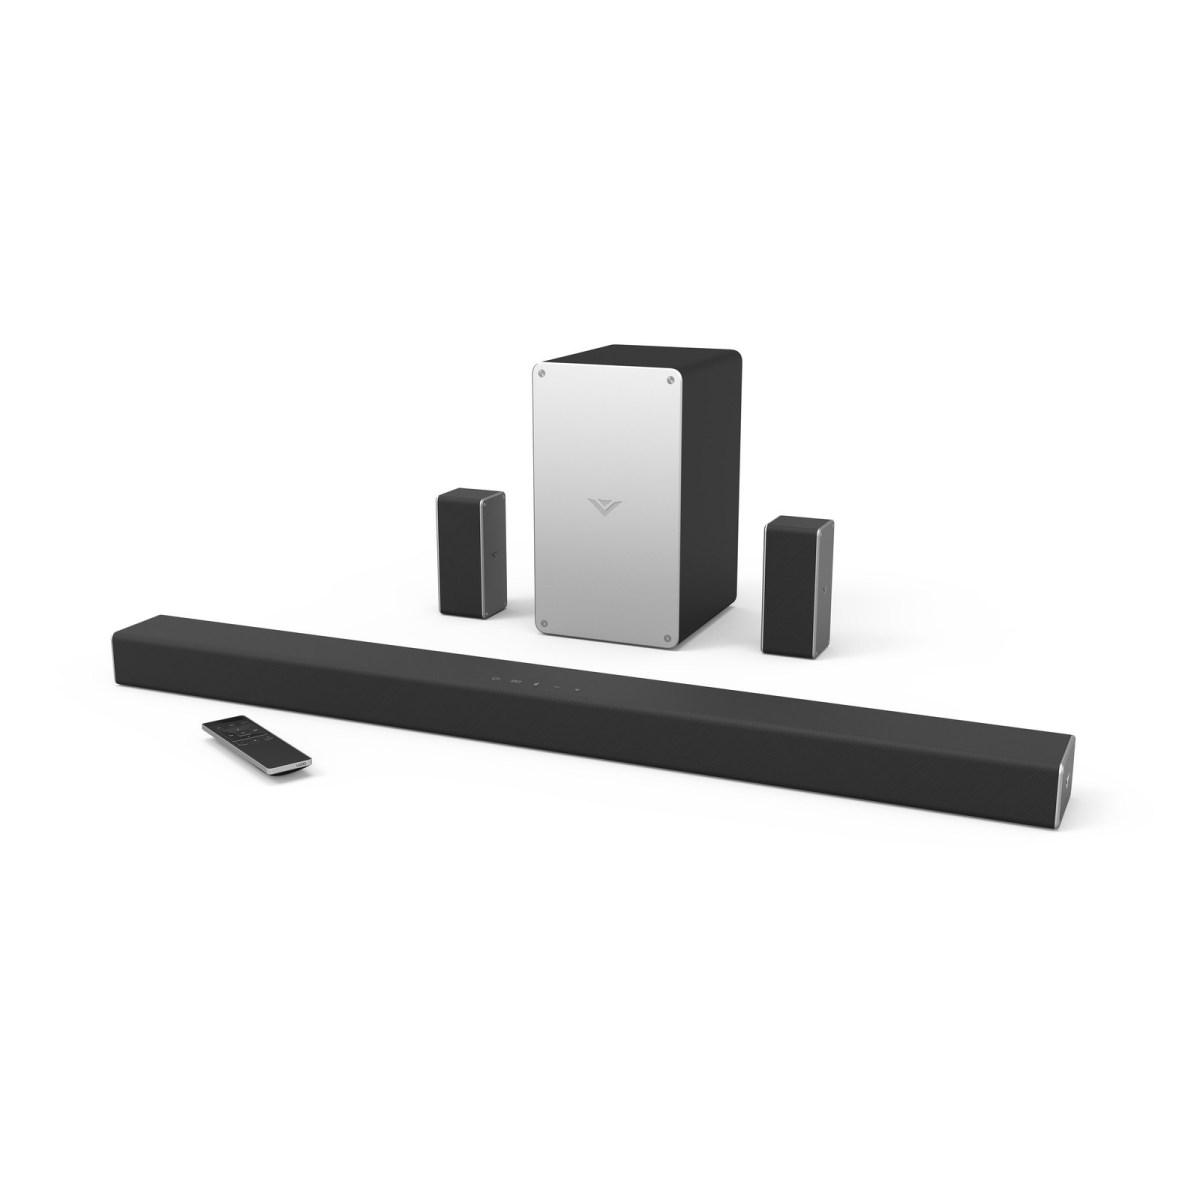 Vizio's new wireless soundbar has Chromecast built-in and ...